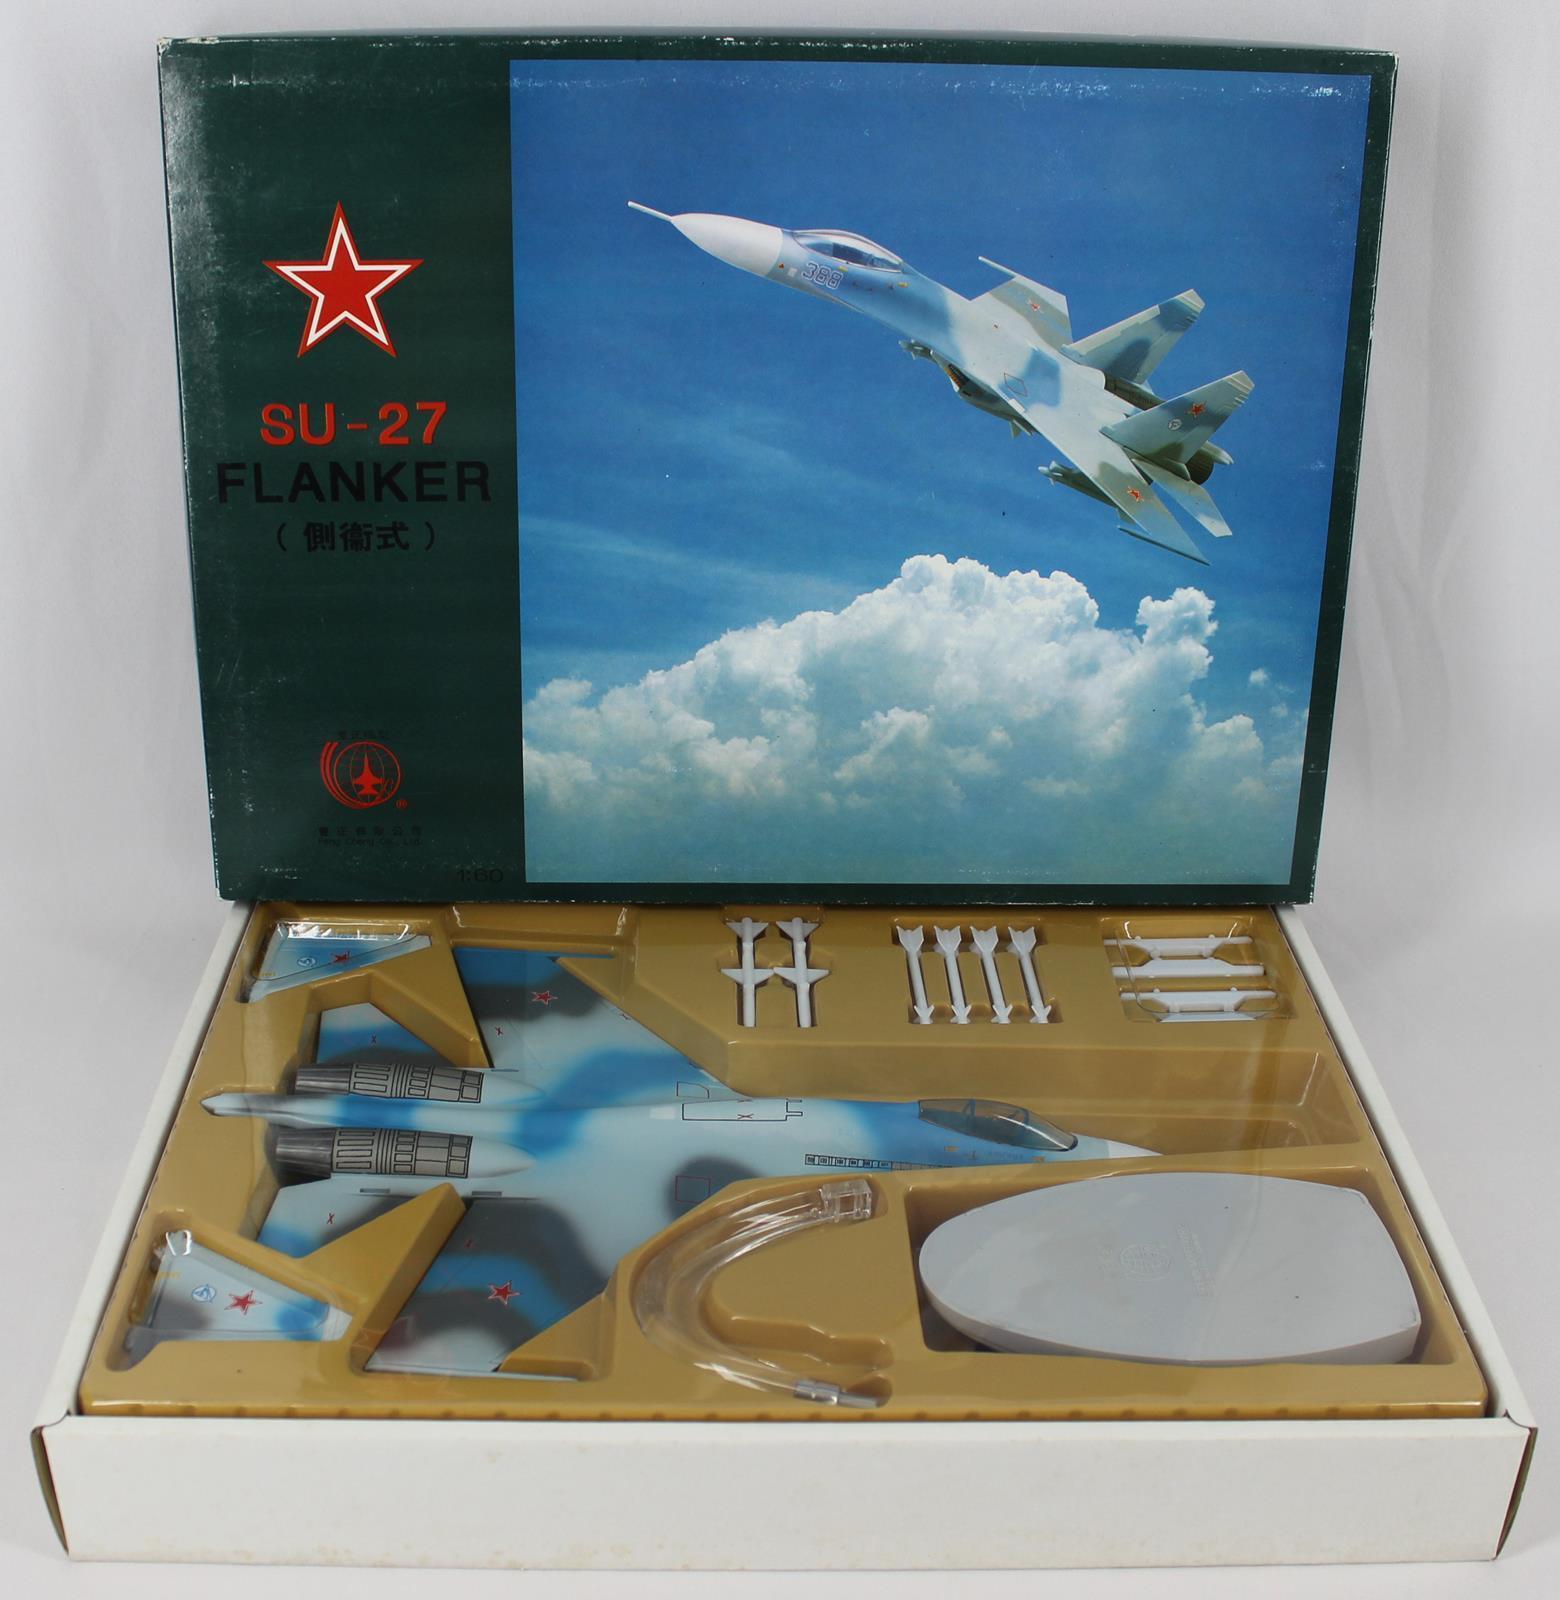 Phoenix Model Corp  1036 SU-27 Flanker Russian Fighter 1 60 Scale NEW - OPEN BOX